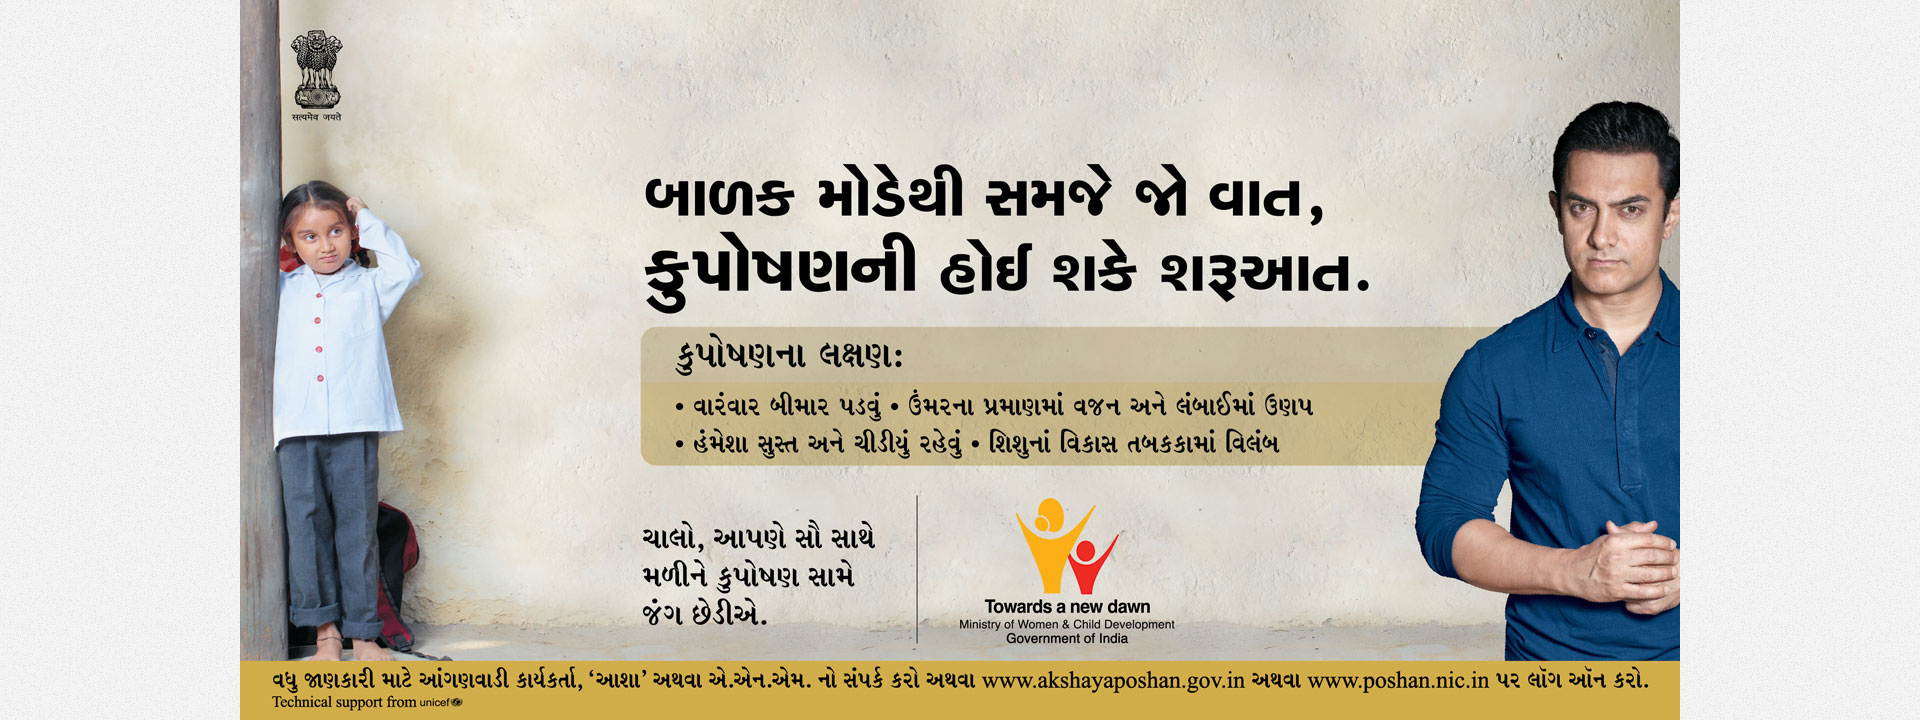 Poshan Videos - ગુજરાતી